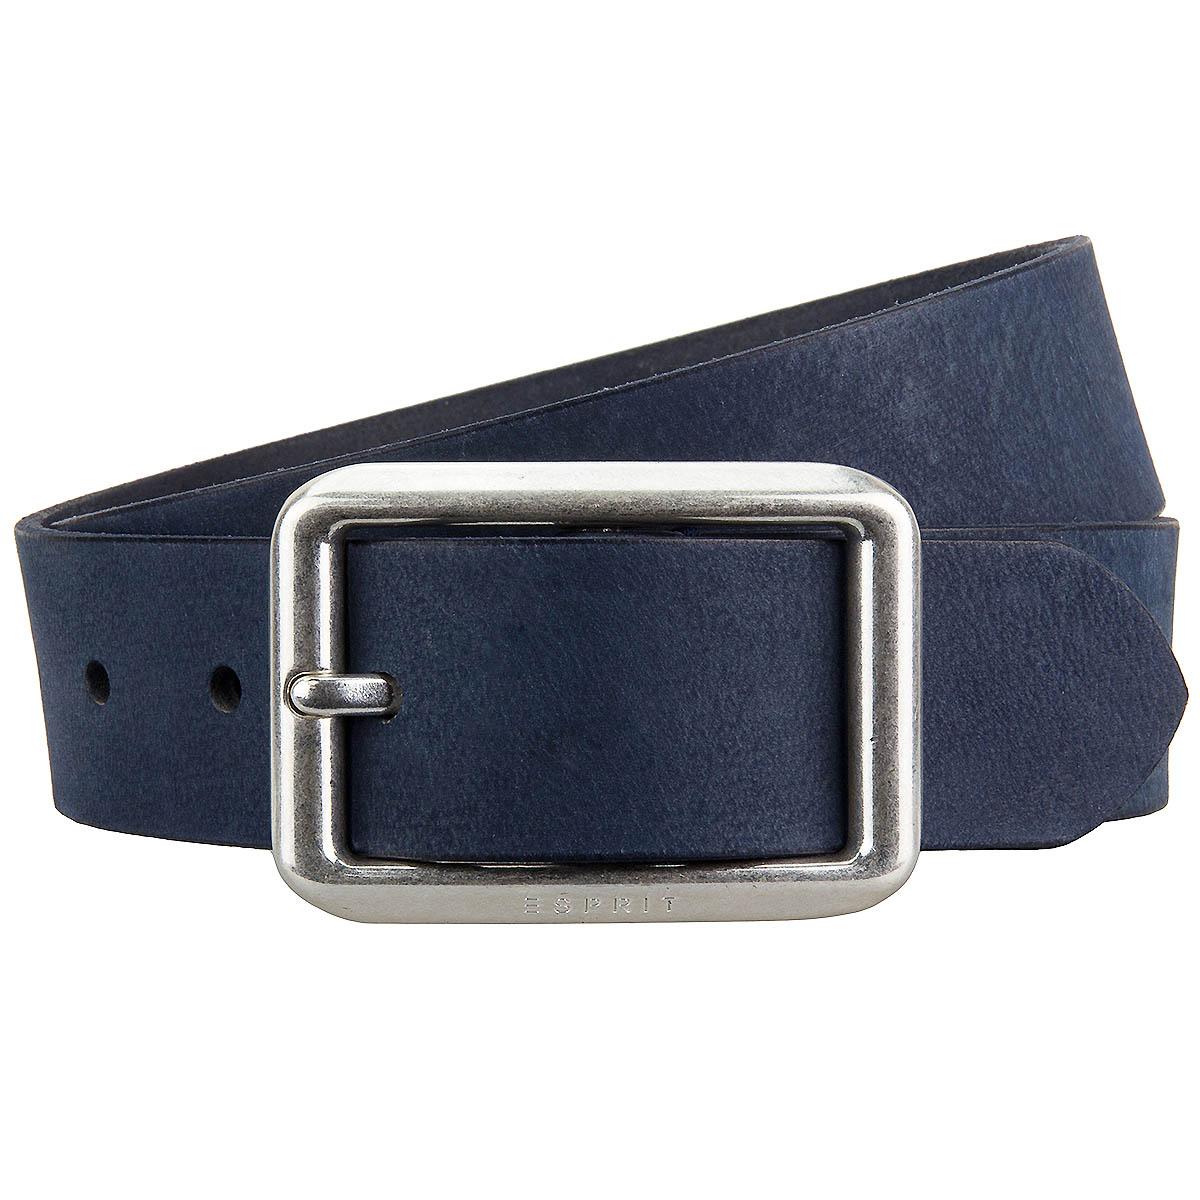 Esprit Leder Gürtel mit Dornschließe Colour Basic Belt 086EA1S009-E400